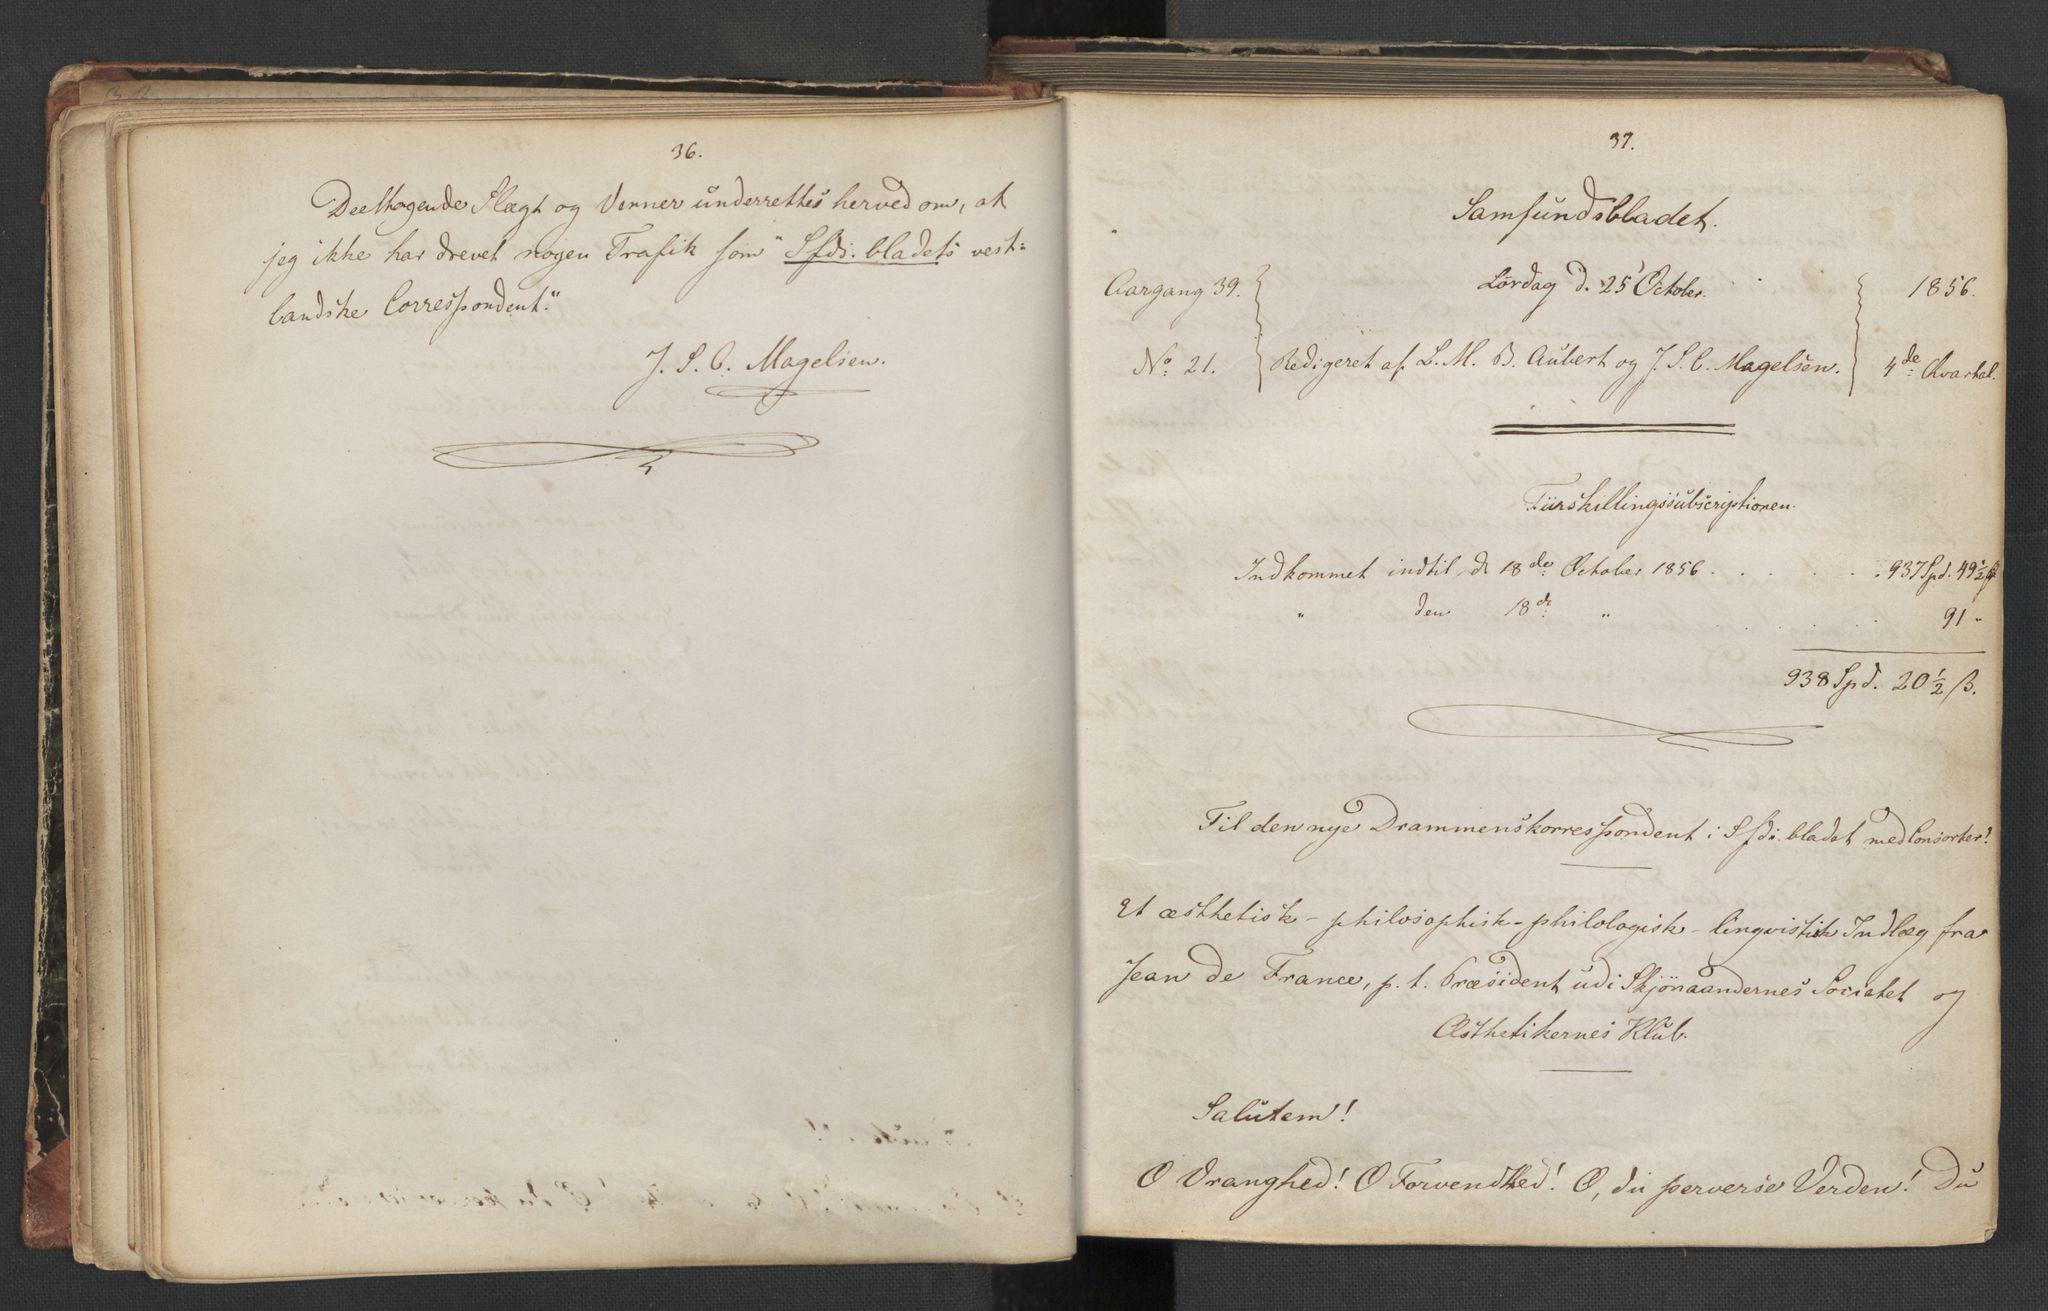 RA, Det Norske Studentersamfund, X/Xa/L0006, 1856-1857, s. 22